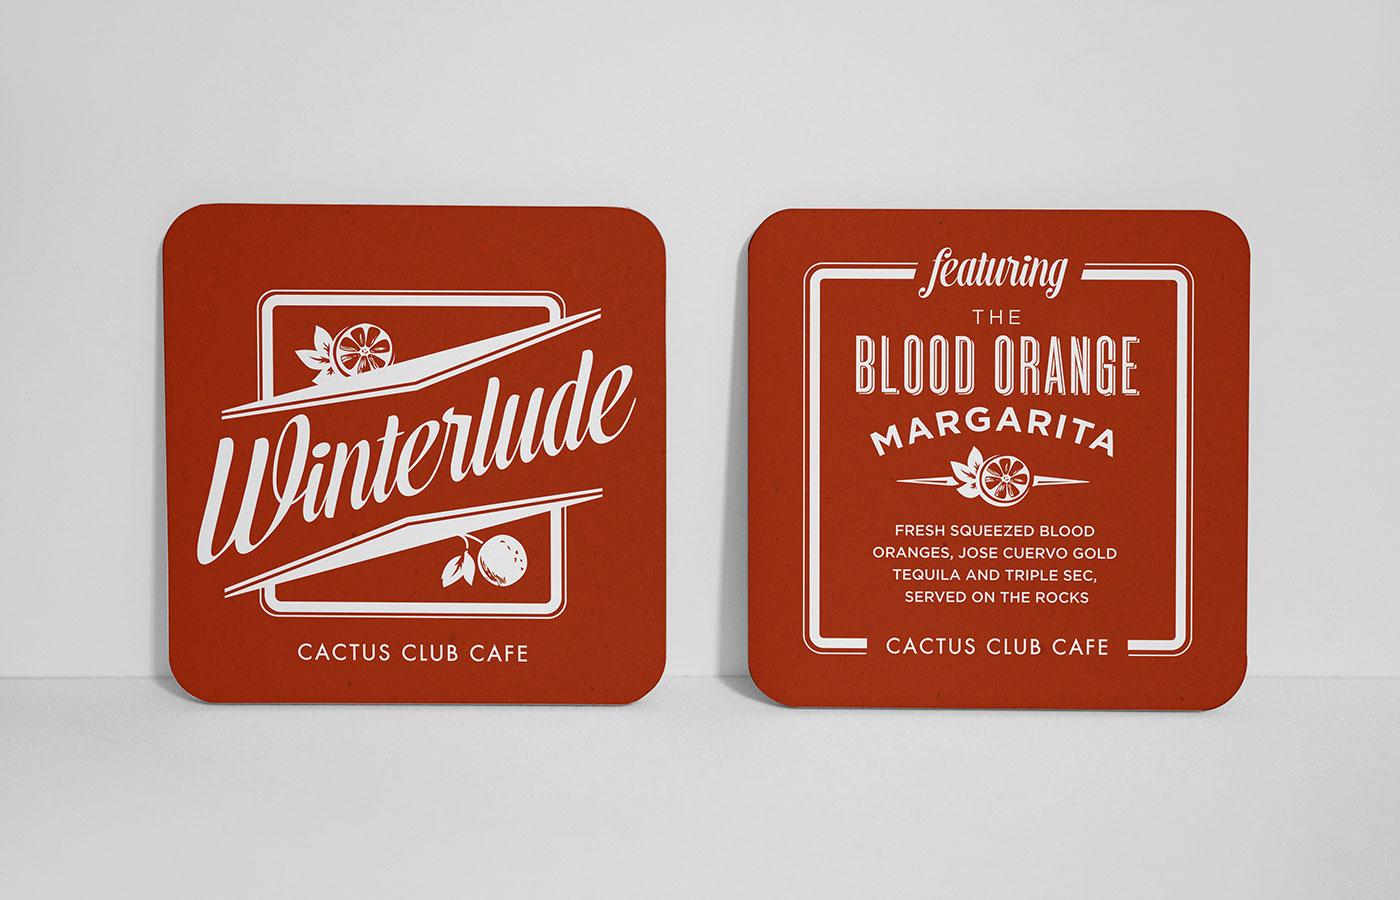 covetdesign_logo-design_branding_package-design_graphic-designer_vancouver_work_wide_cactus2